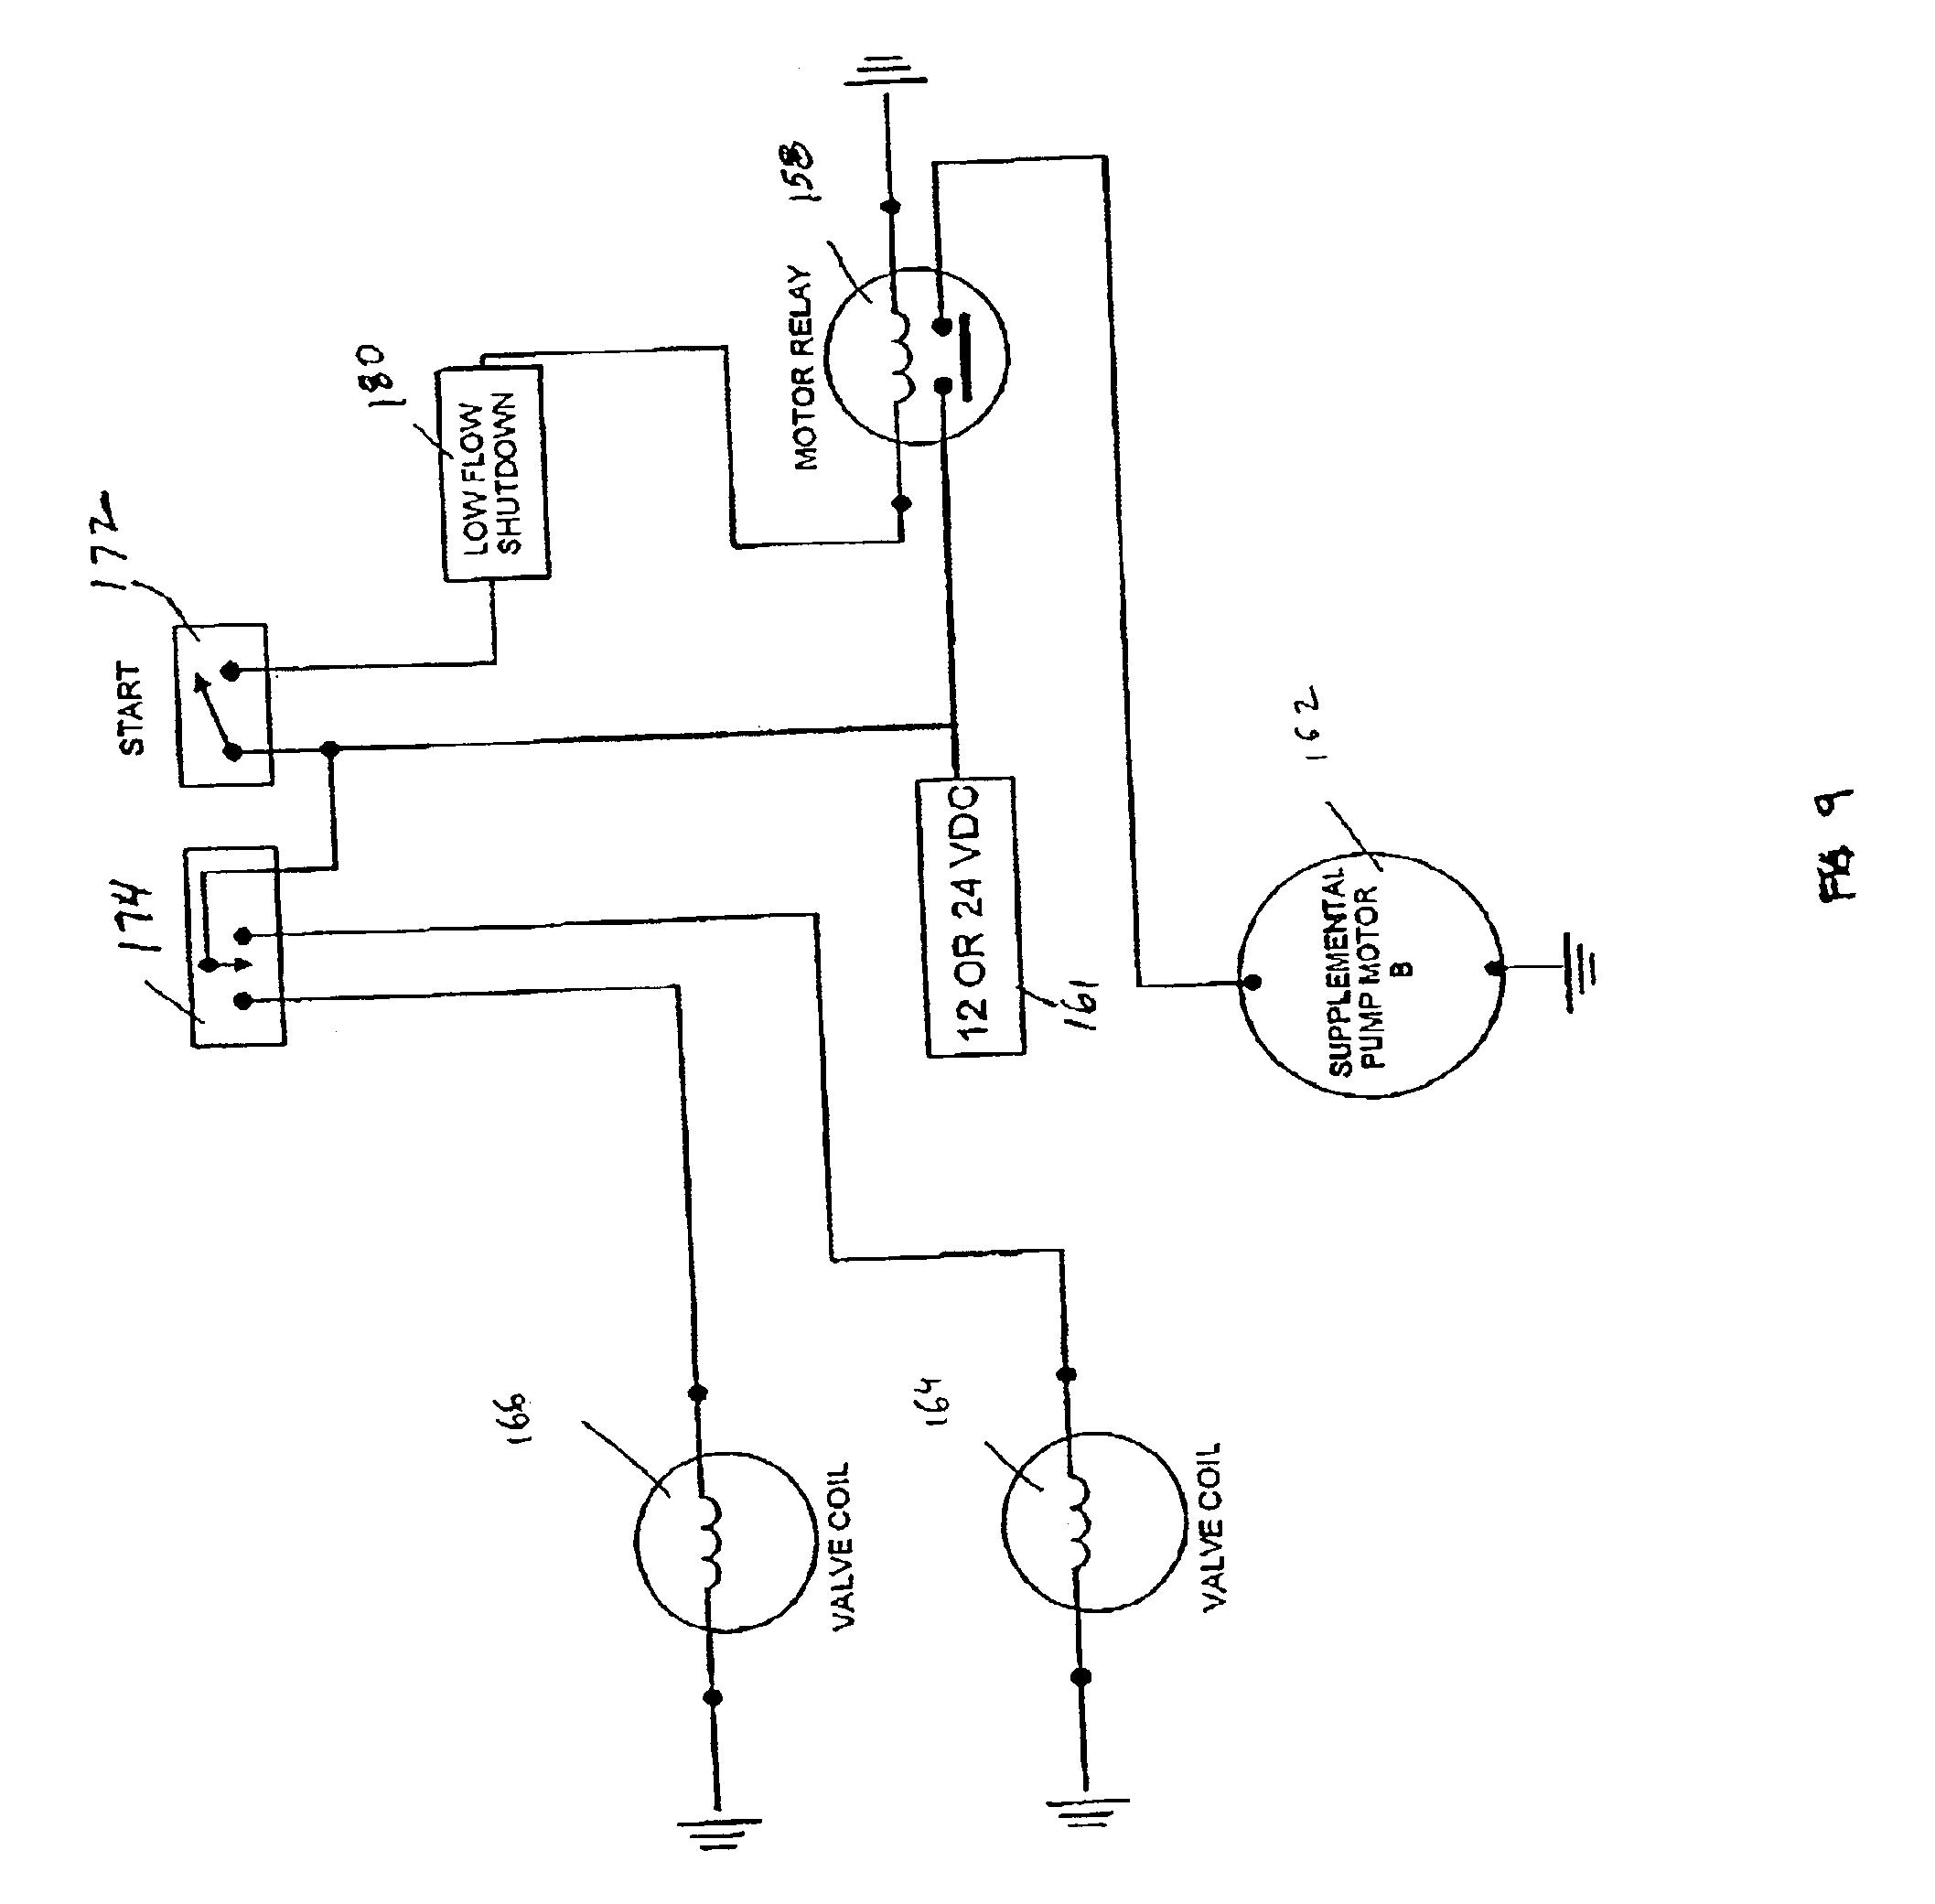 Wagner Dot 552 12v Wiring Diagram : 33 Wiring Diagram